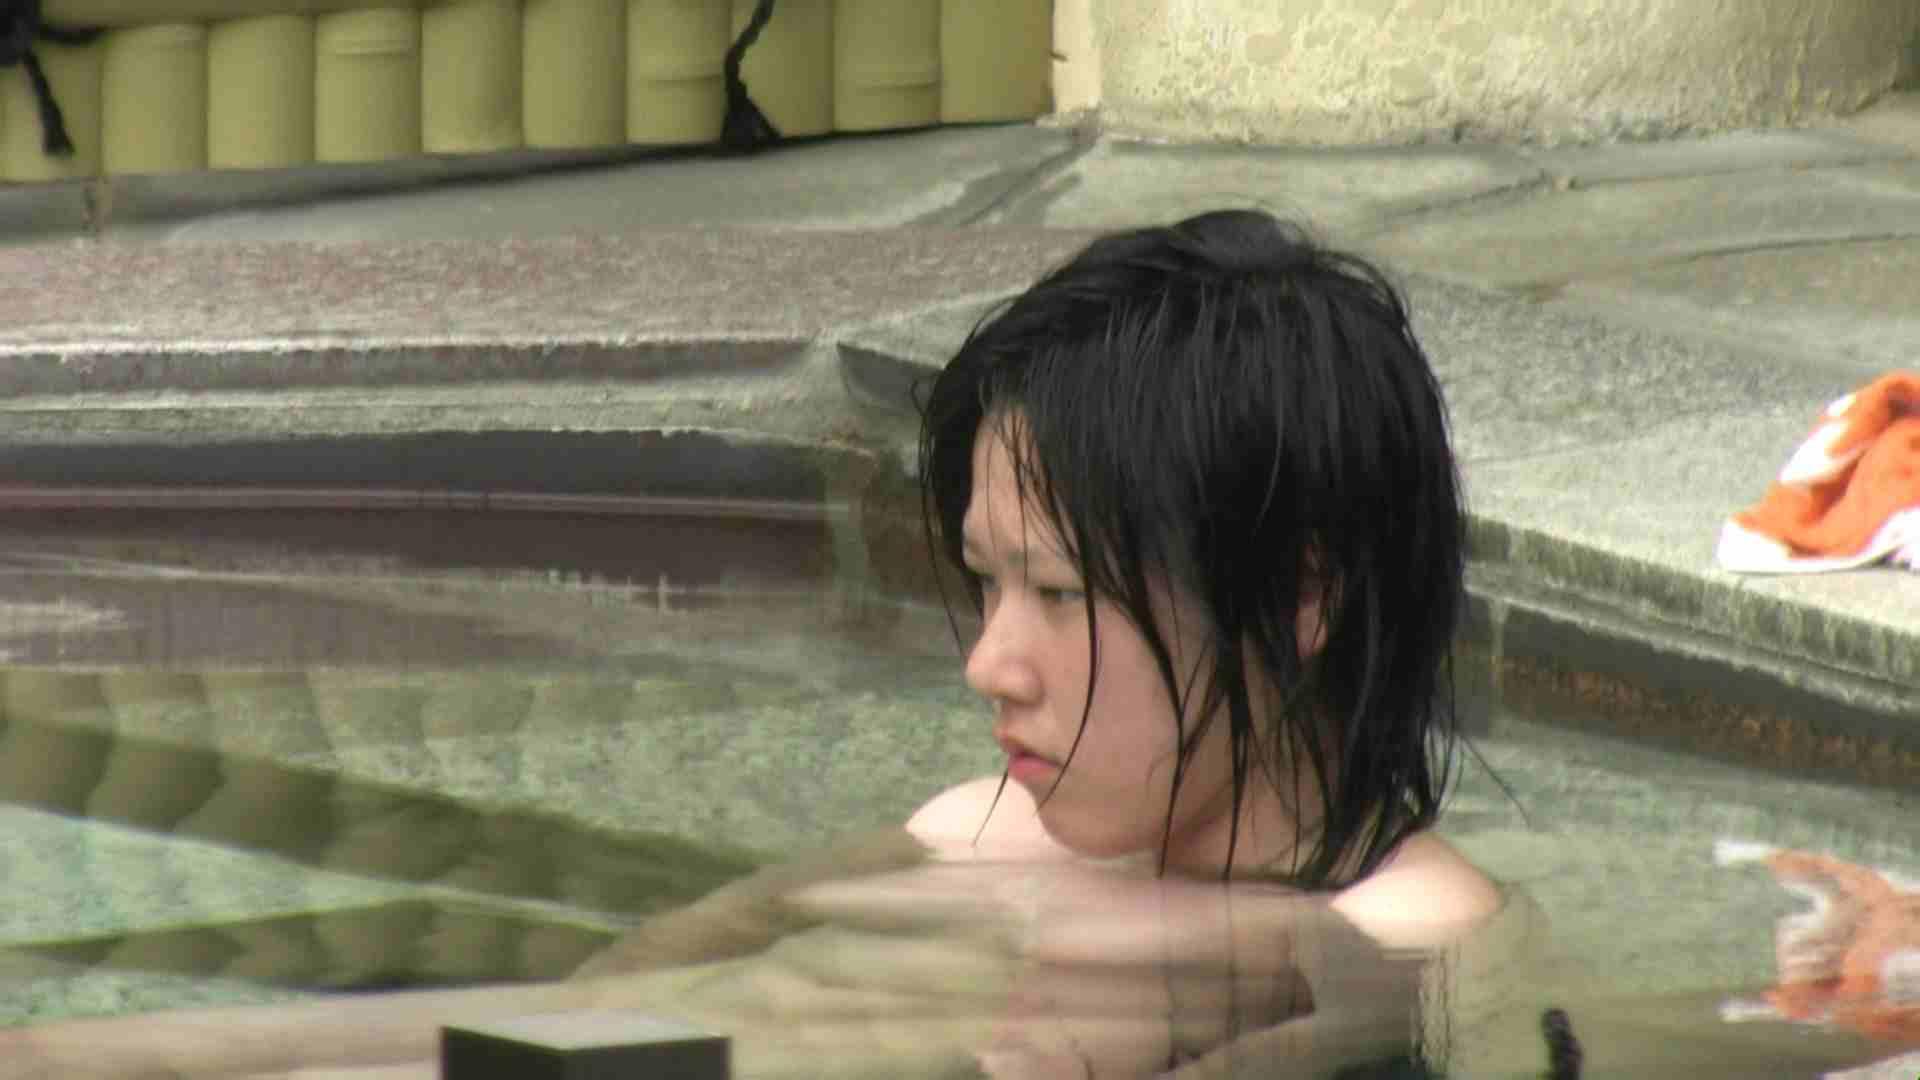 Aquaな露天風呂Vol.36 OL女体  78連発 45